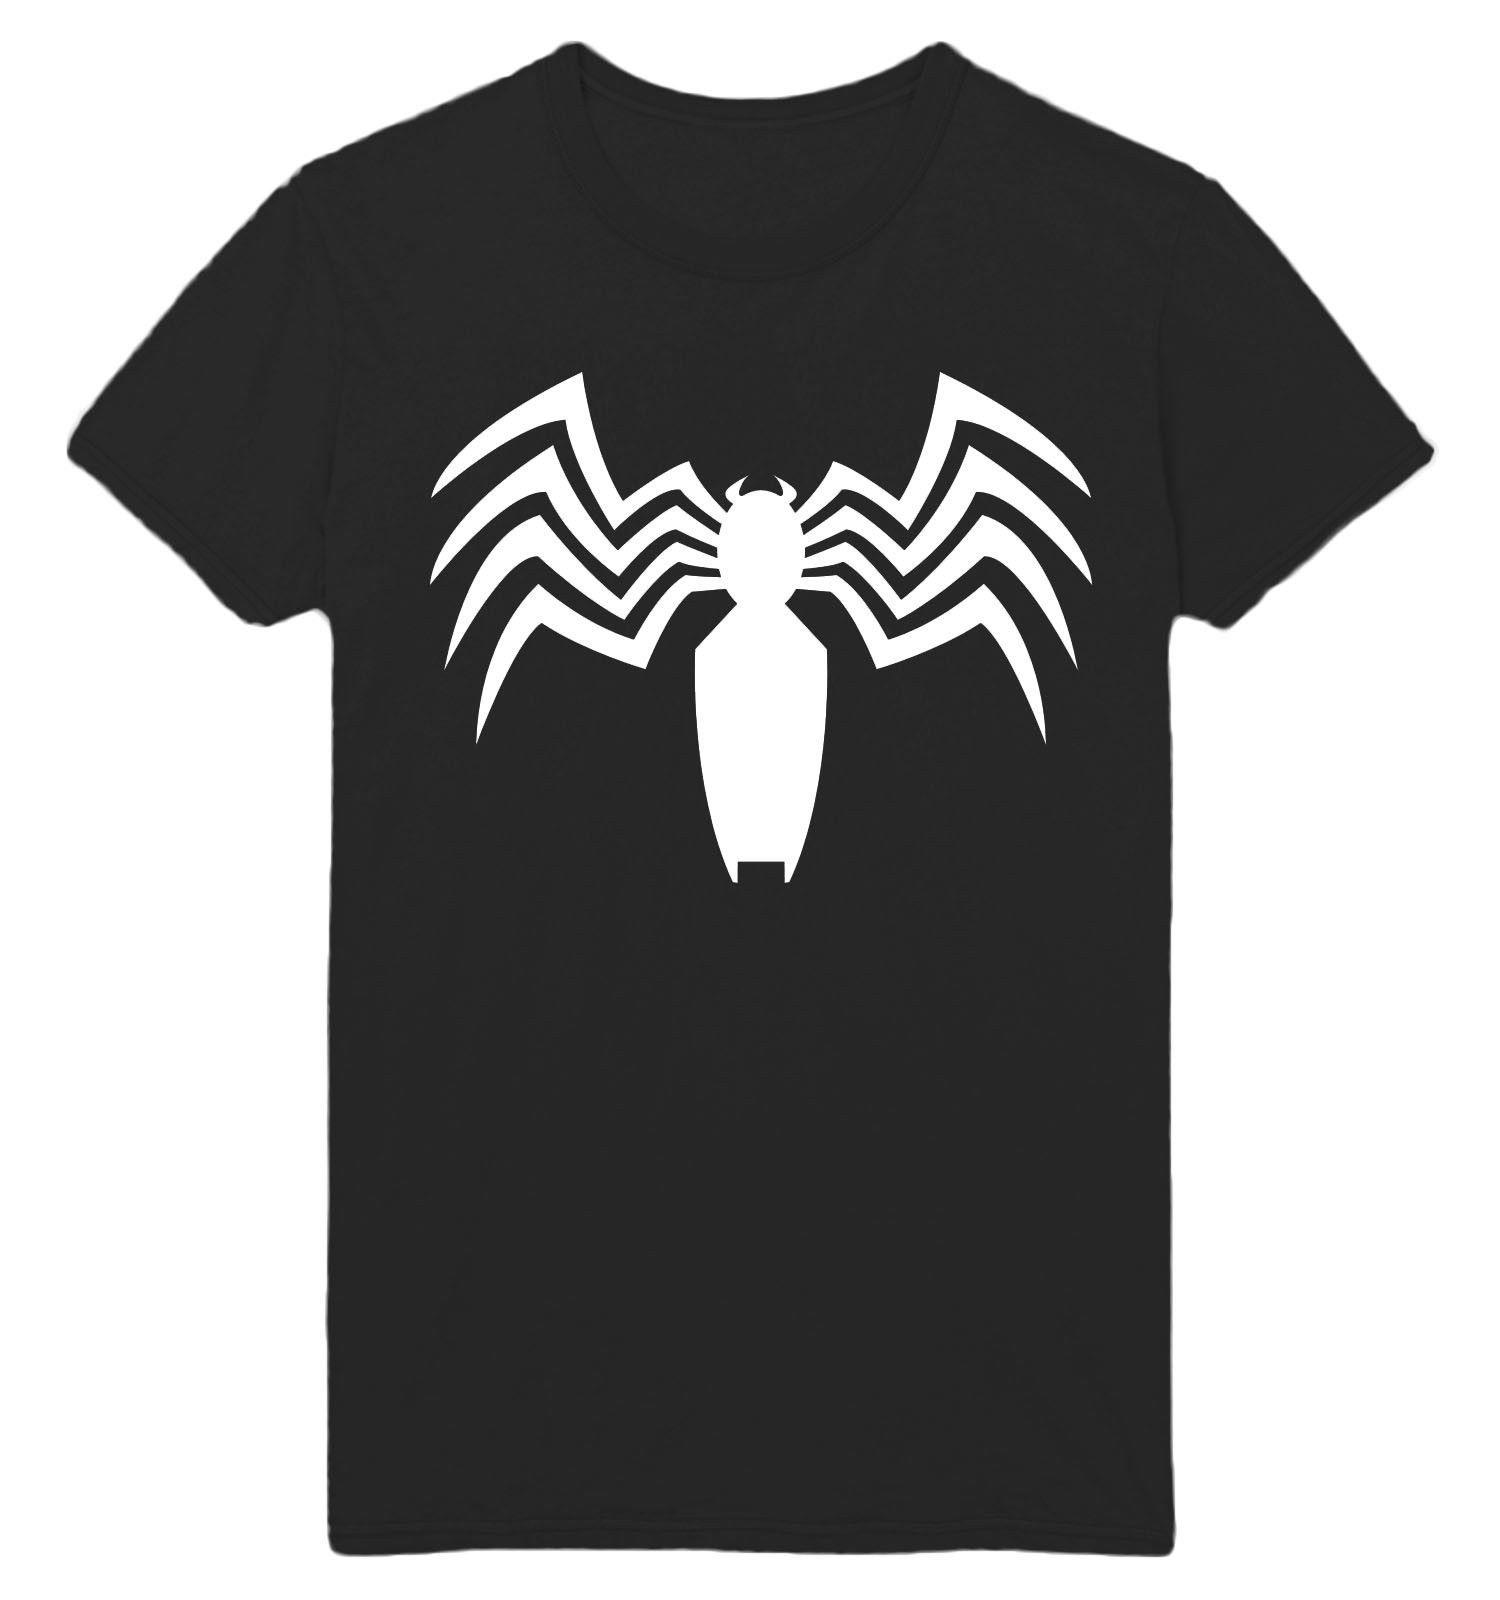 VENOM 2018 MARVEL TOM HARDY VENOM LOGO PH702 UNISEX BLACK TEE funny gift  Short short Sleeve T-Shirt Tops Round Neck Tees